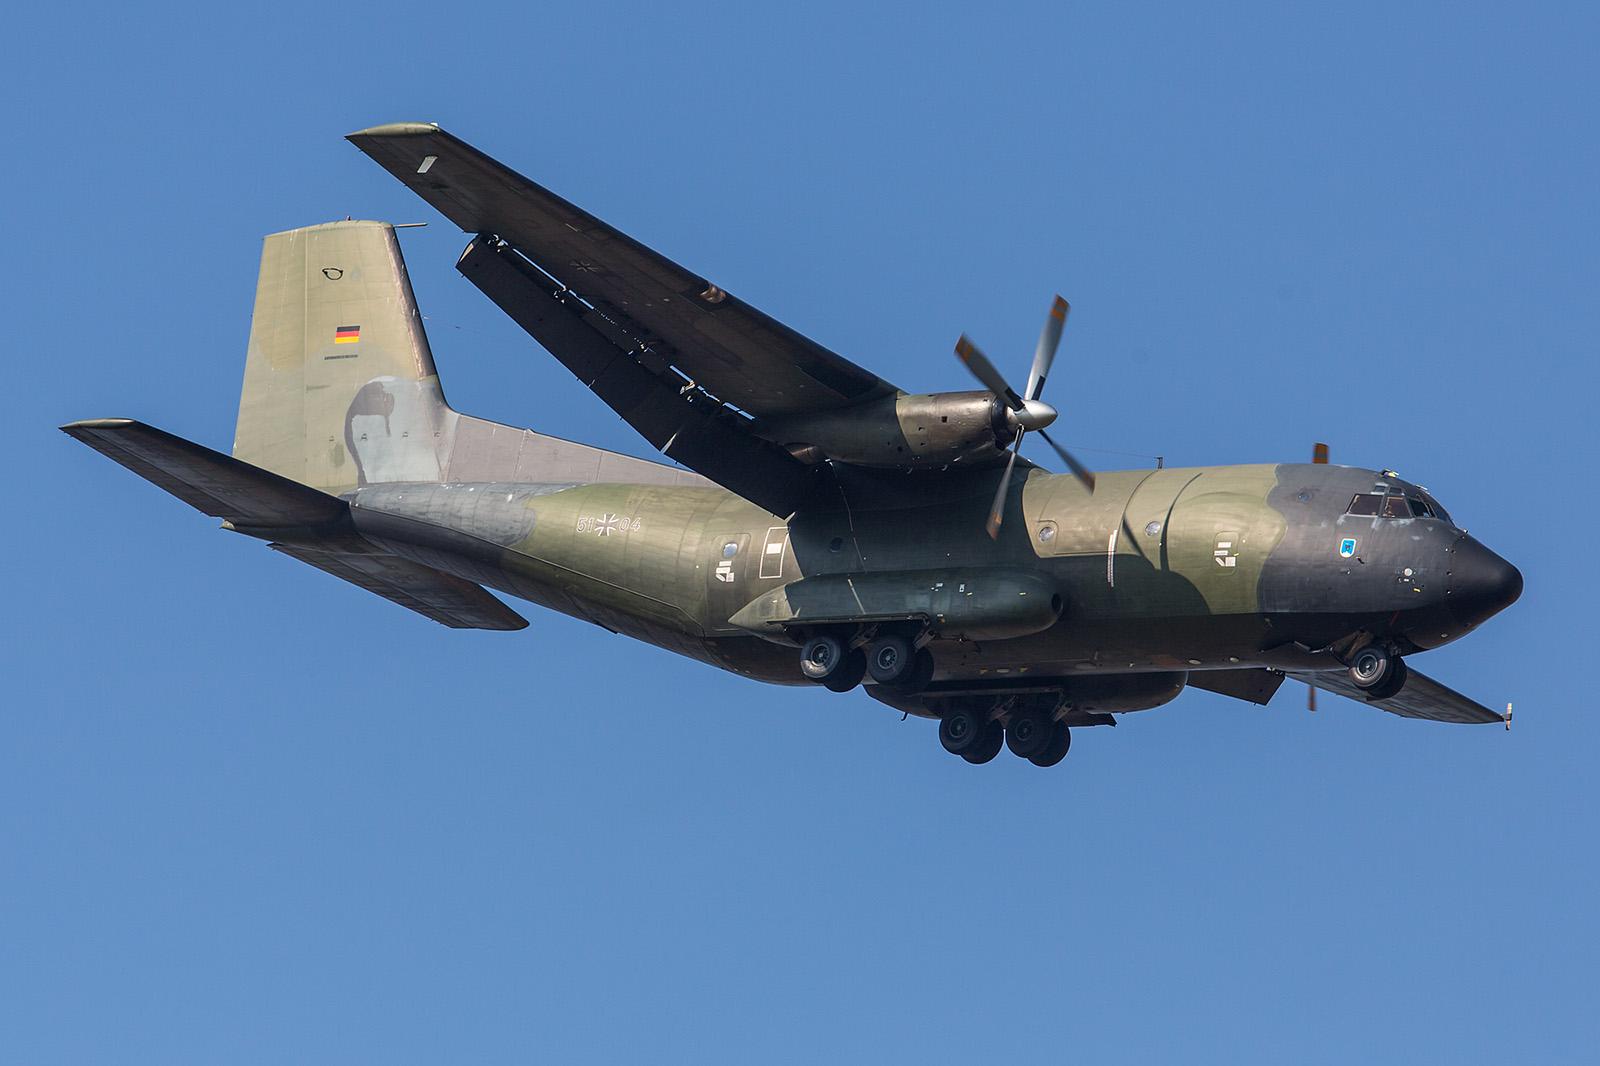 C-160 Transall aus Penzing.